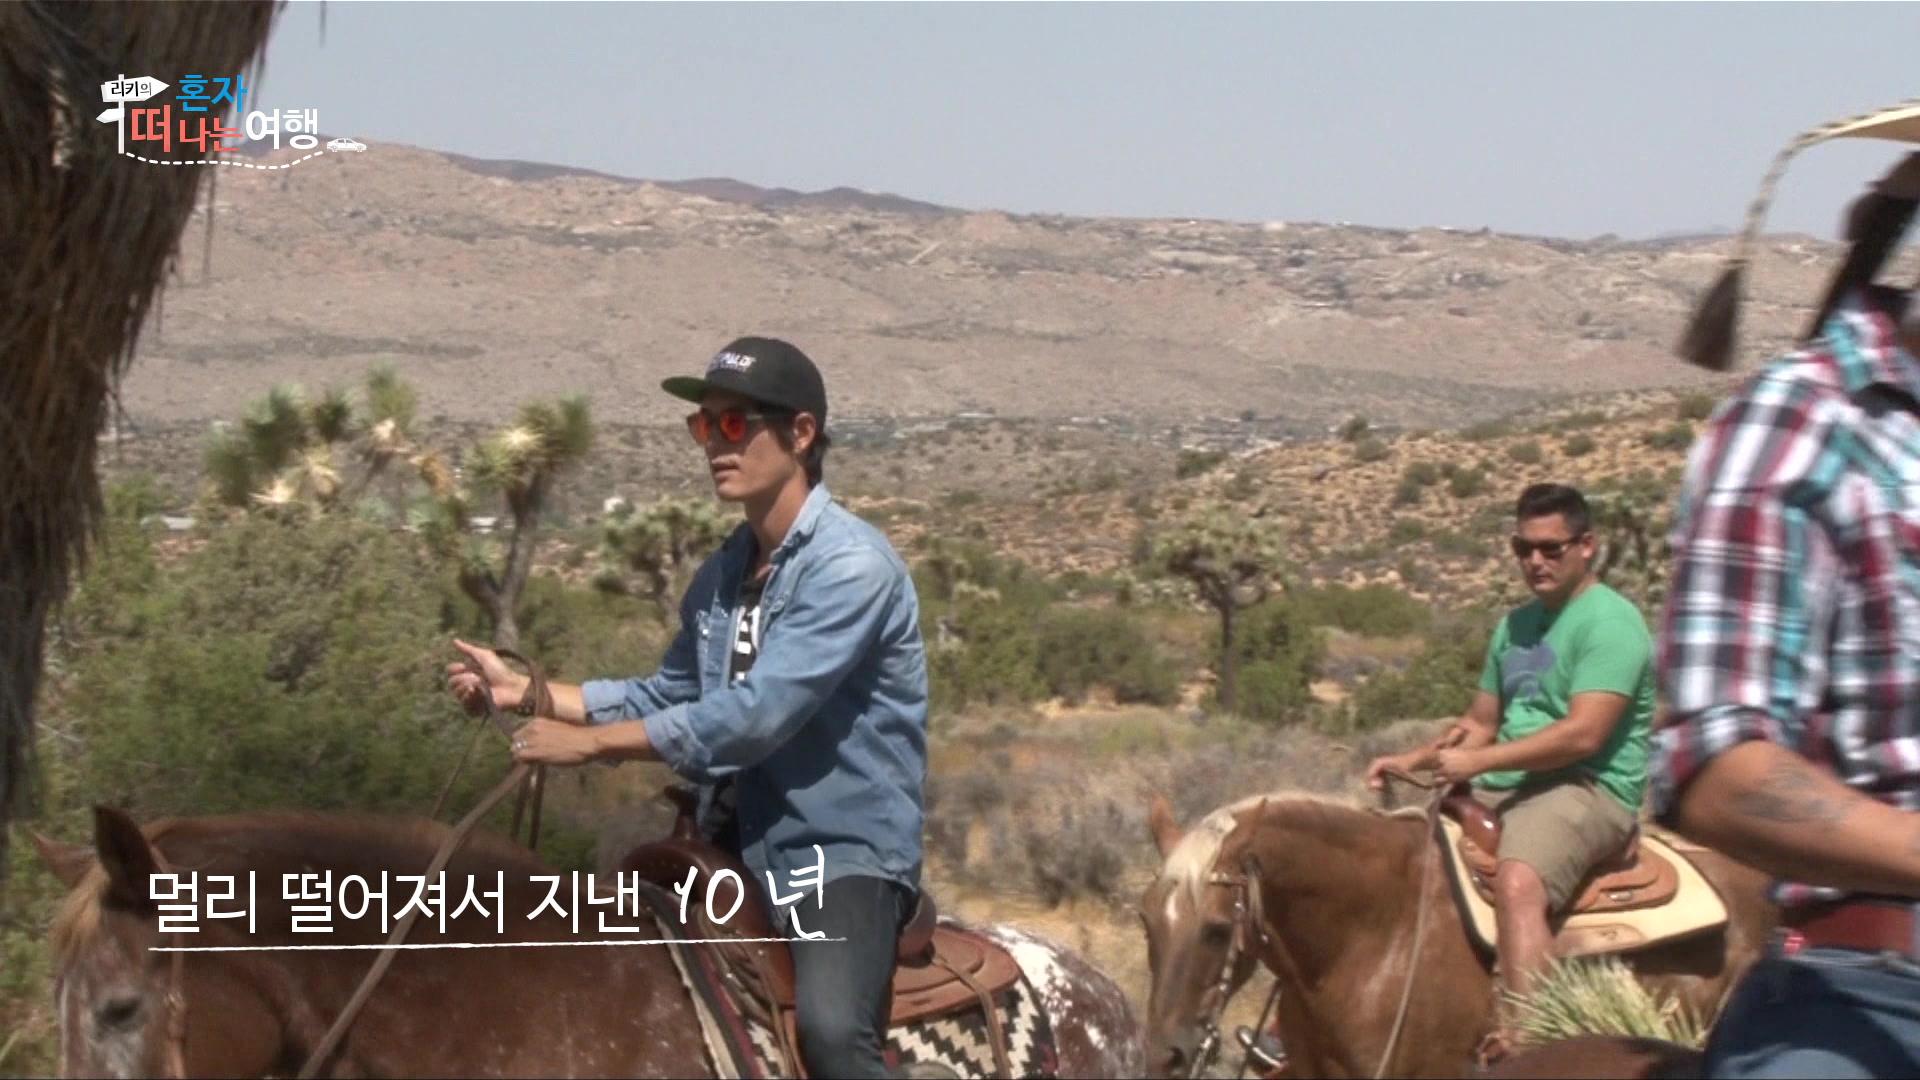 Ricky Traveling Alone Episode 6